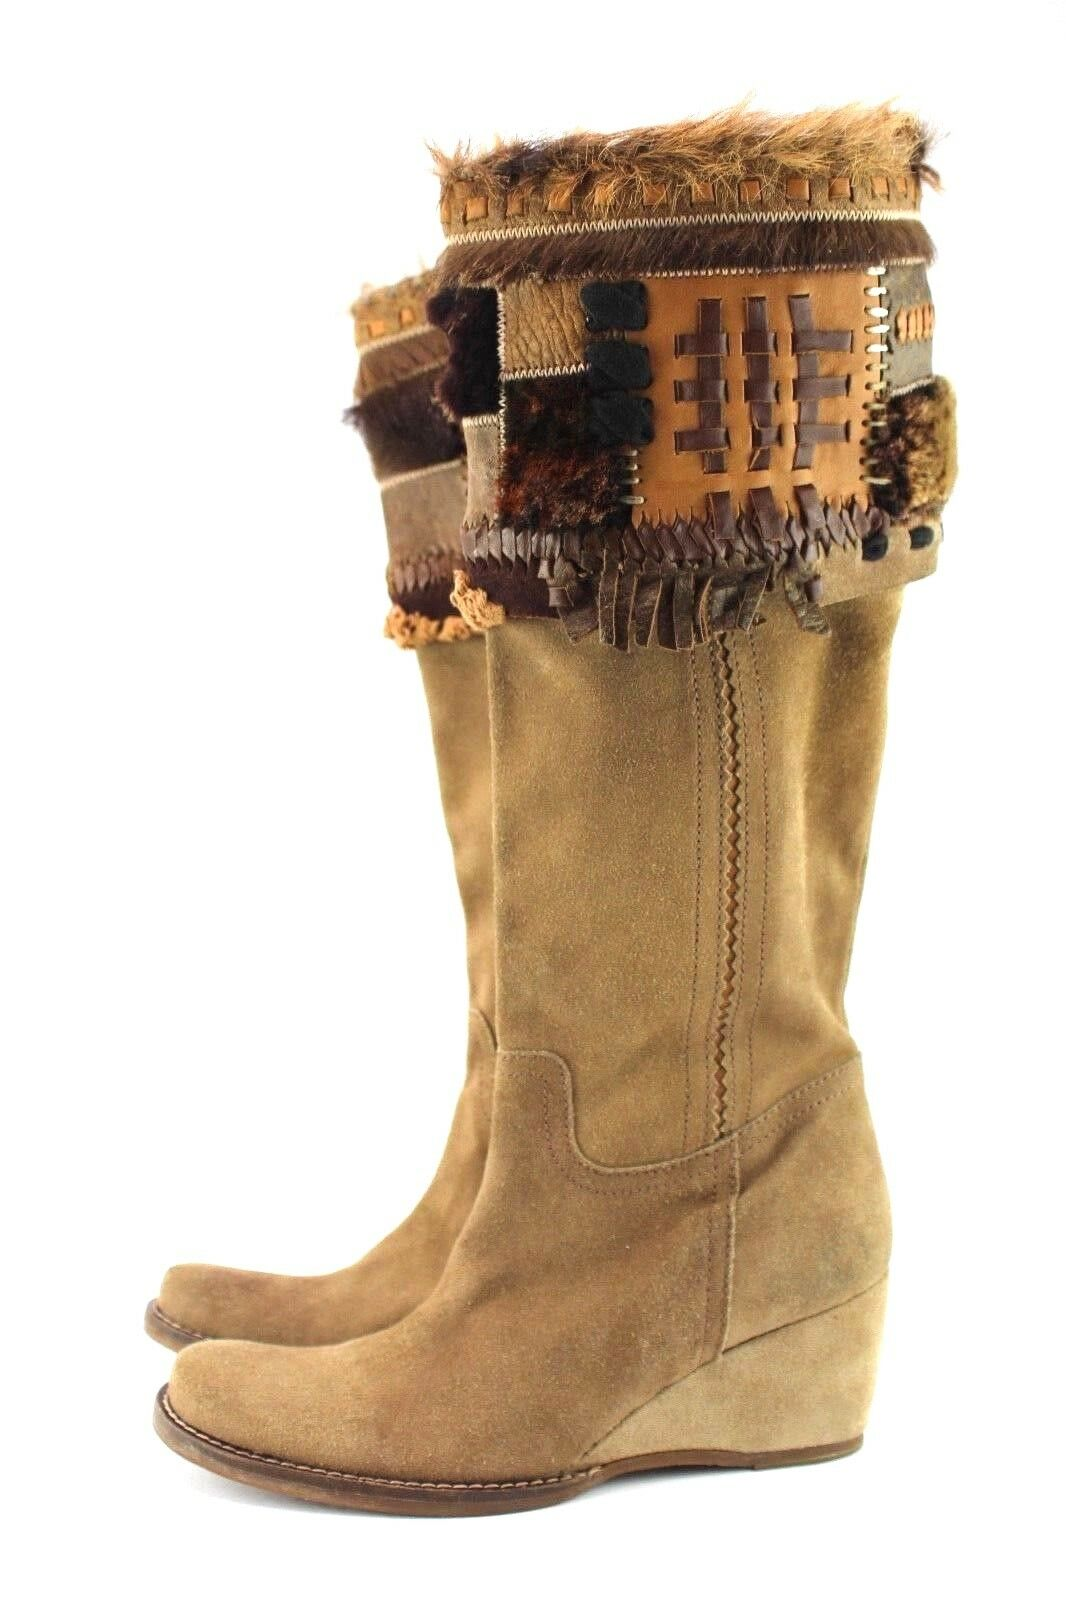 Womens Unique Boho Patchwork Tan Fur Suede Boots Wedge US 8 M Apepazza